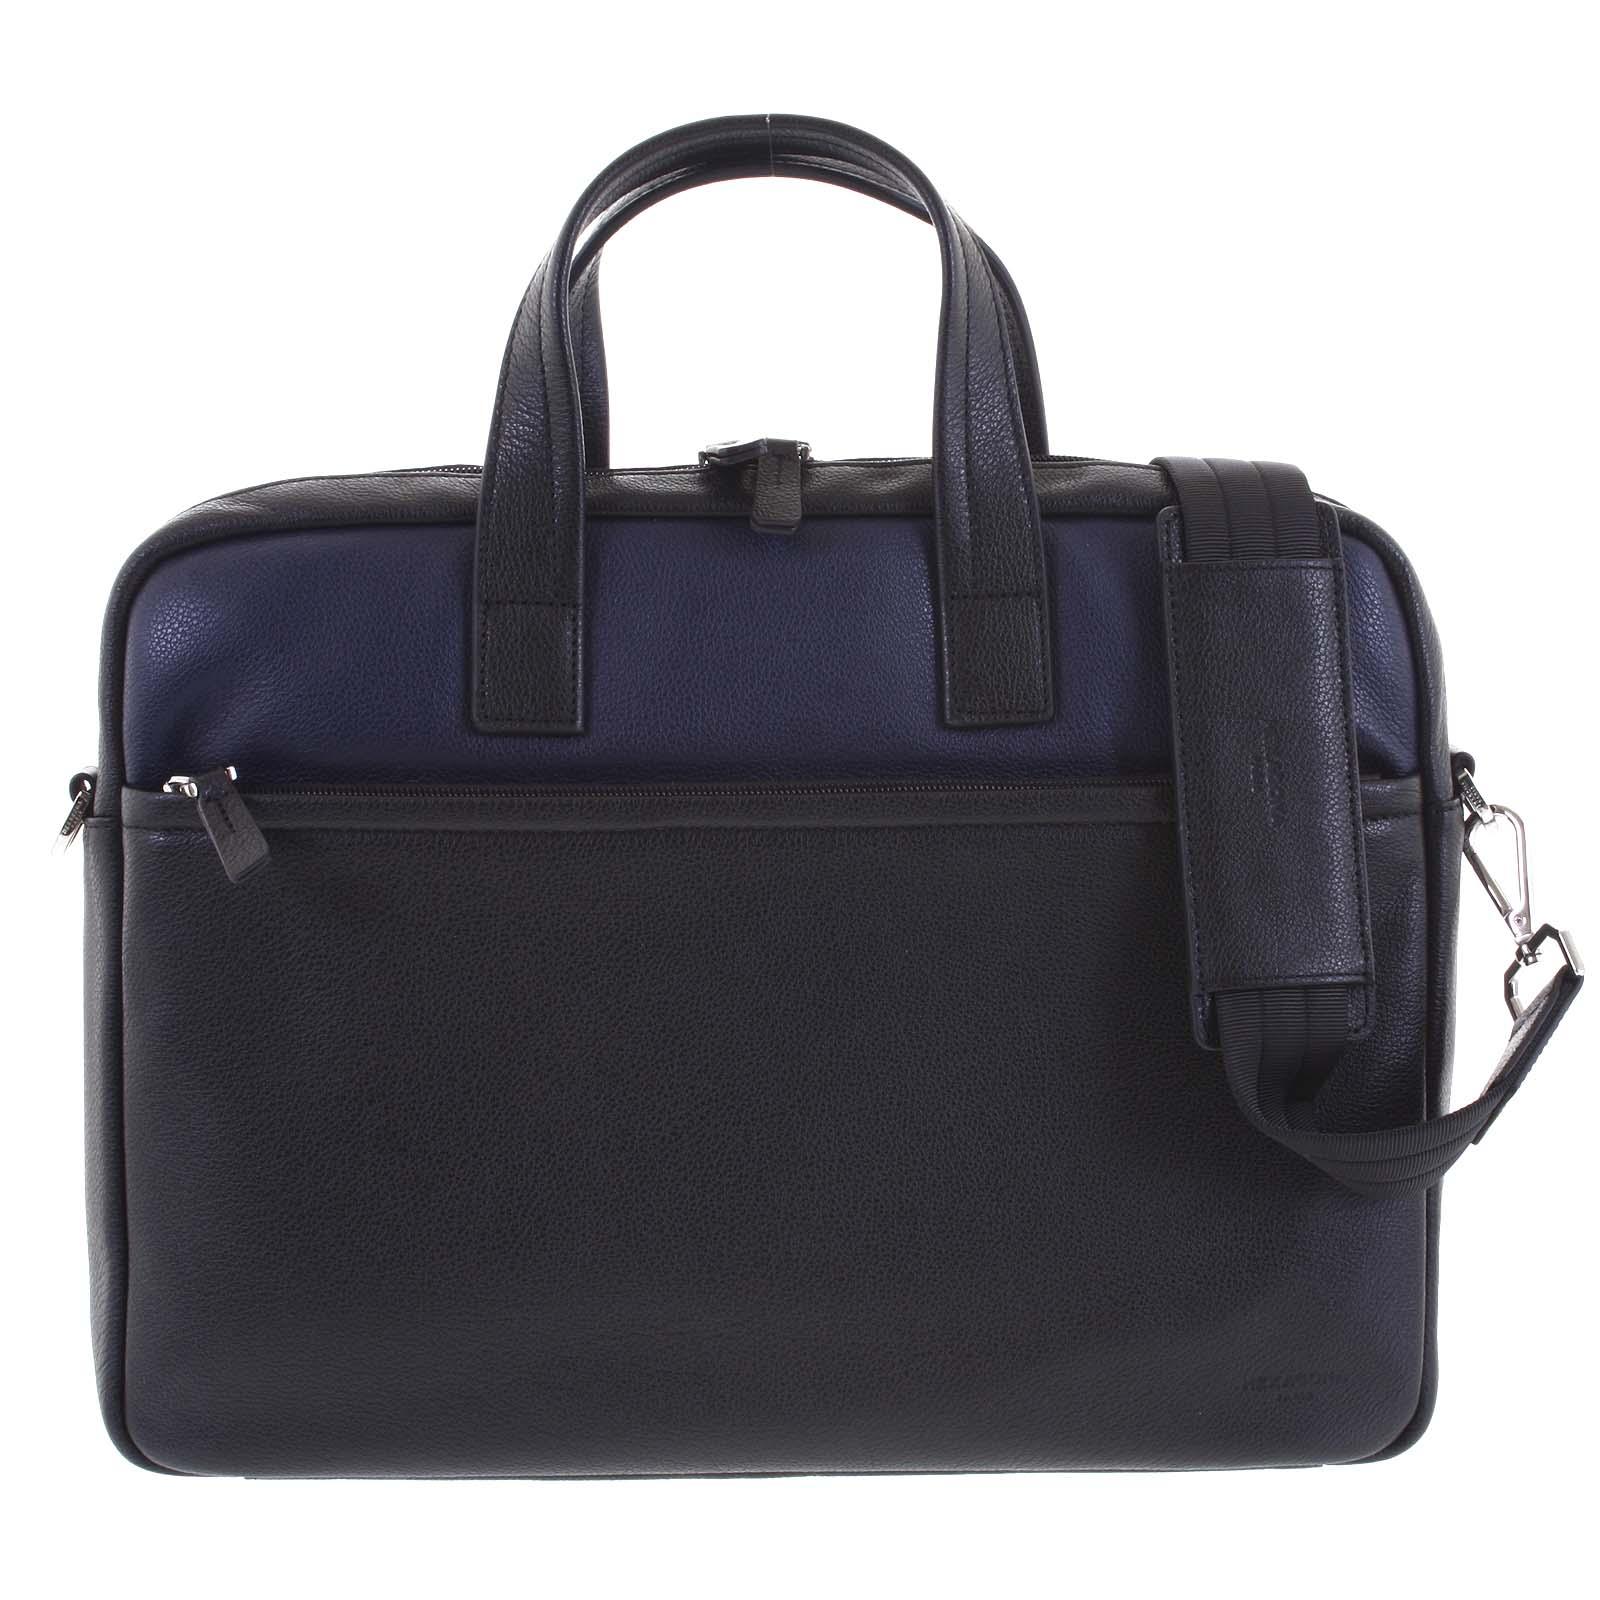 Luxusní pásnká kožená taška černo modrá - Hexagona Friday